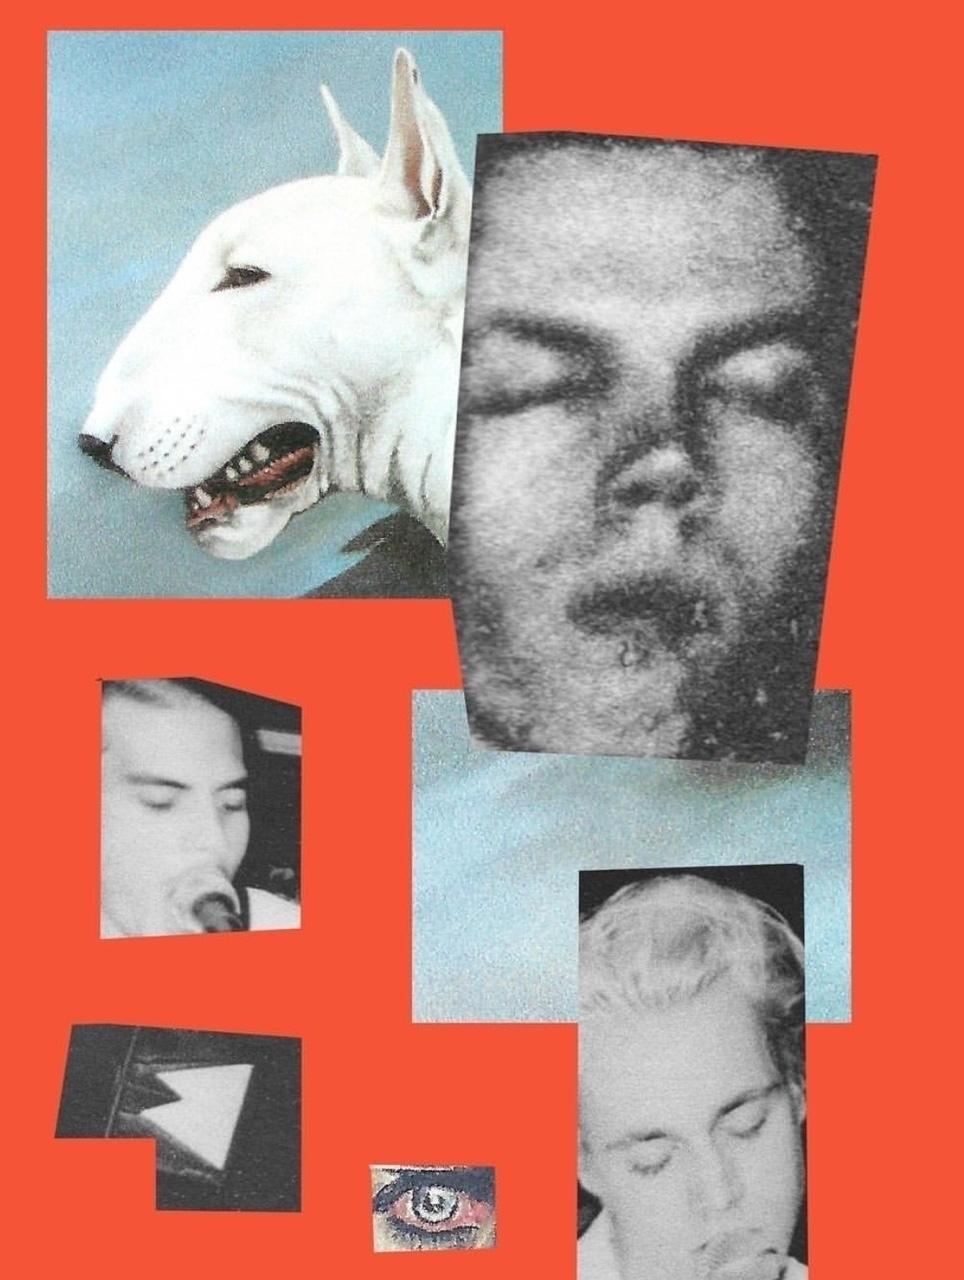 source Young Magazine - design, collage - modernism_is_crap | ello